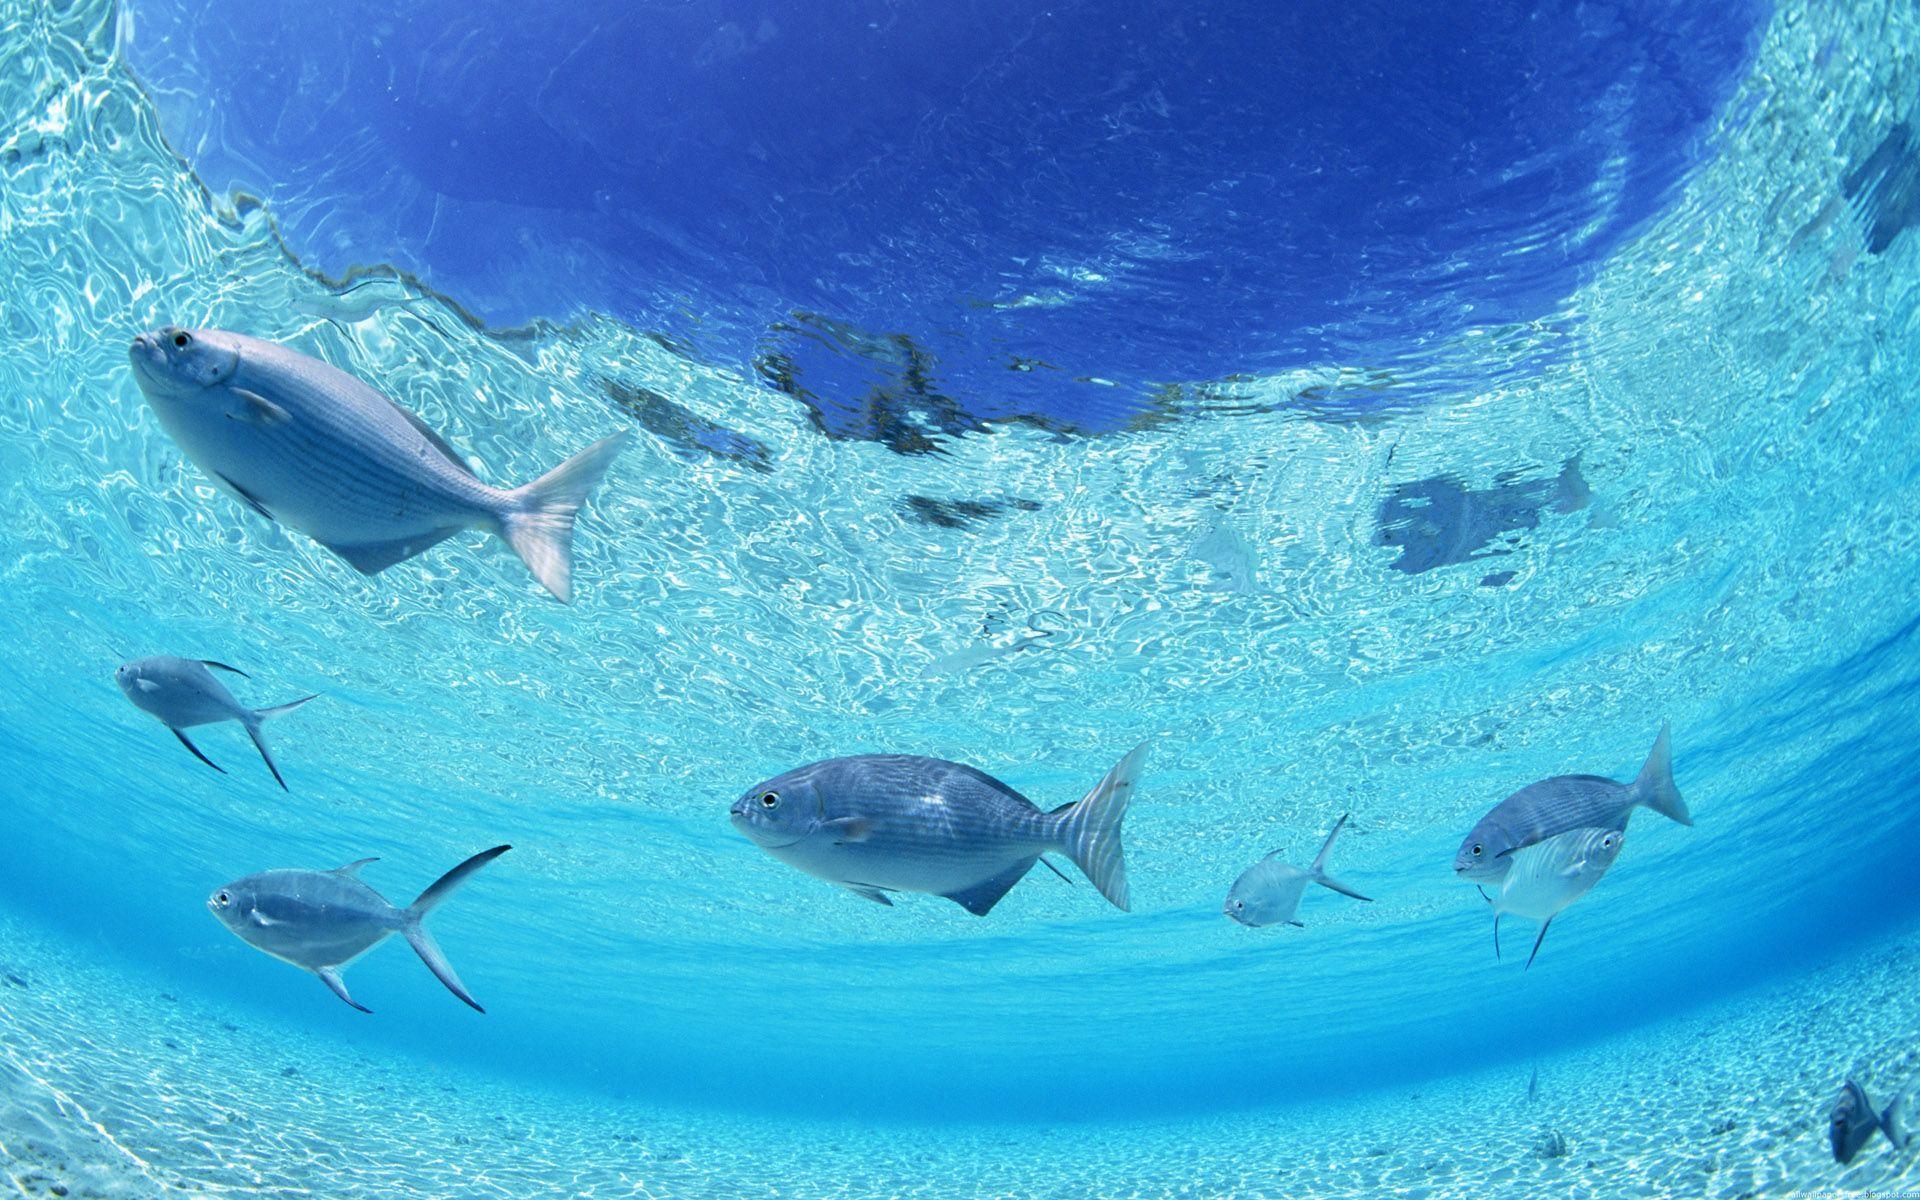 photos of ocean scenes | dynamic ocean scenes desktop wallpaper